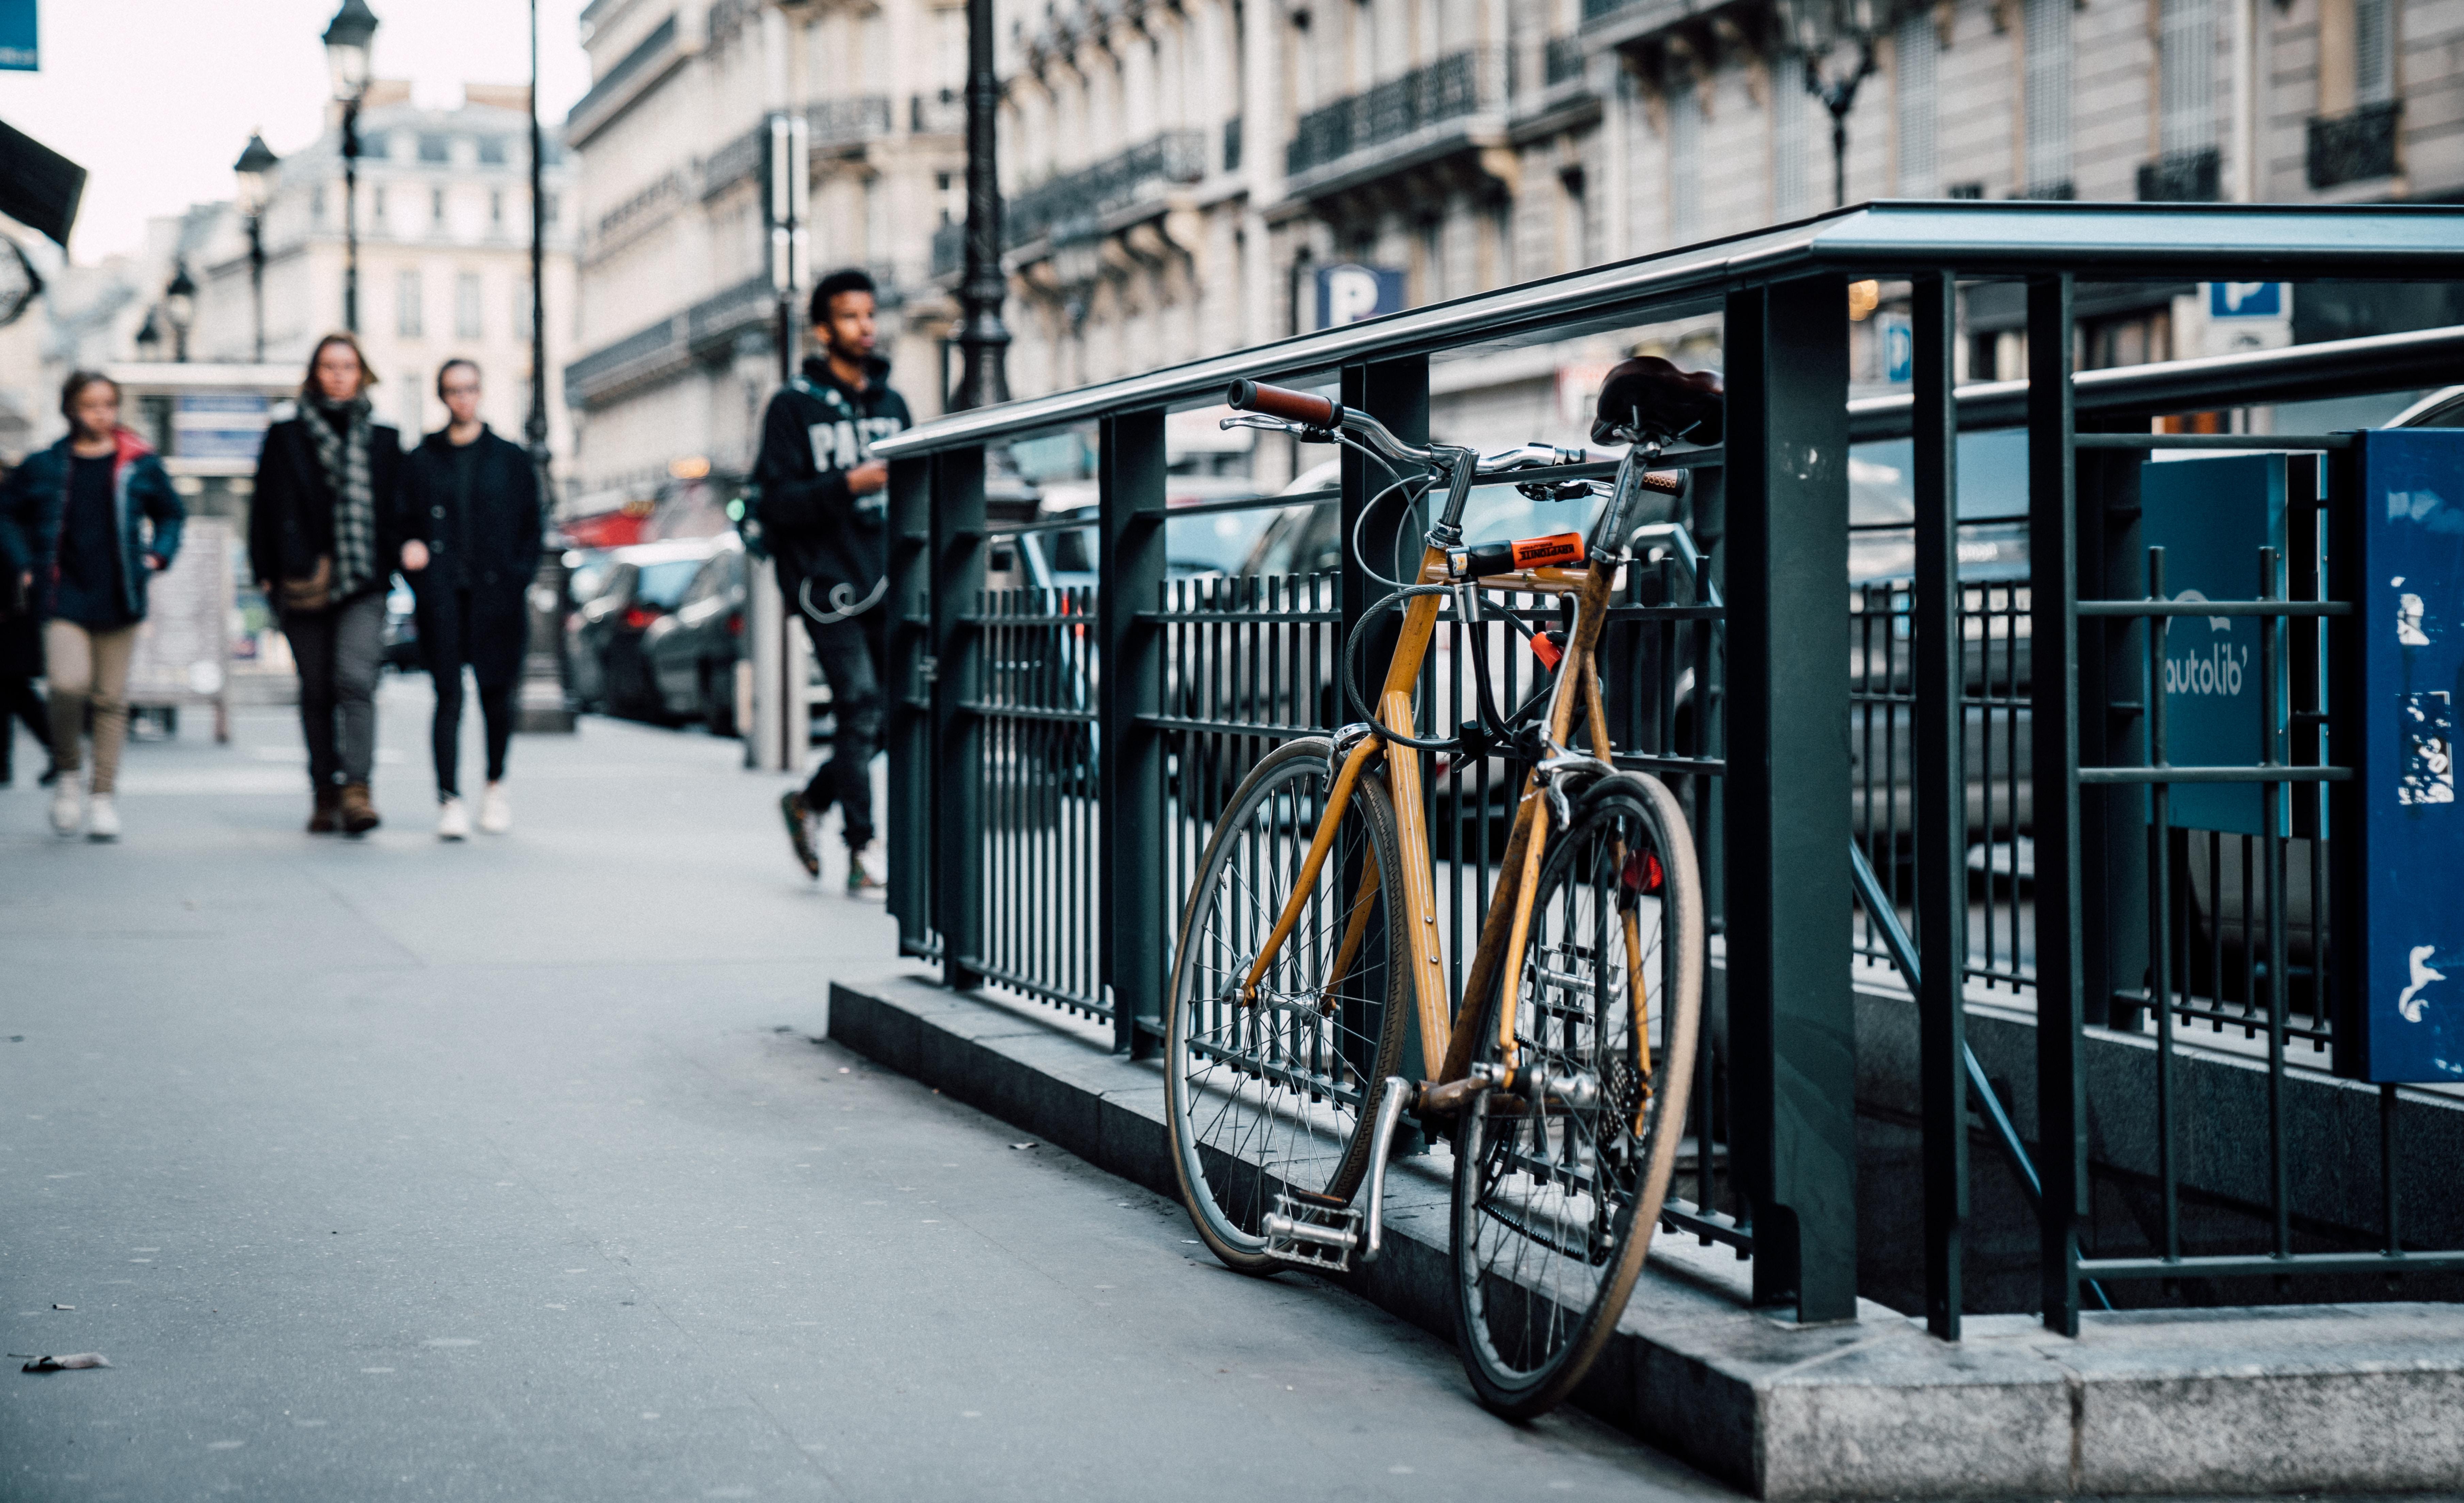 parked orange bicycle on subway railings